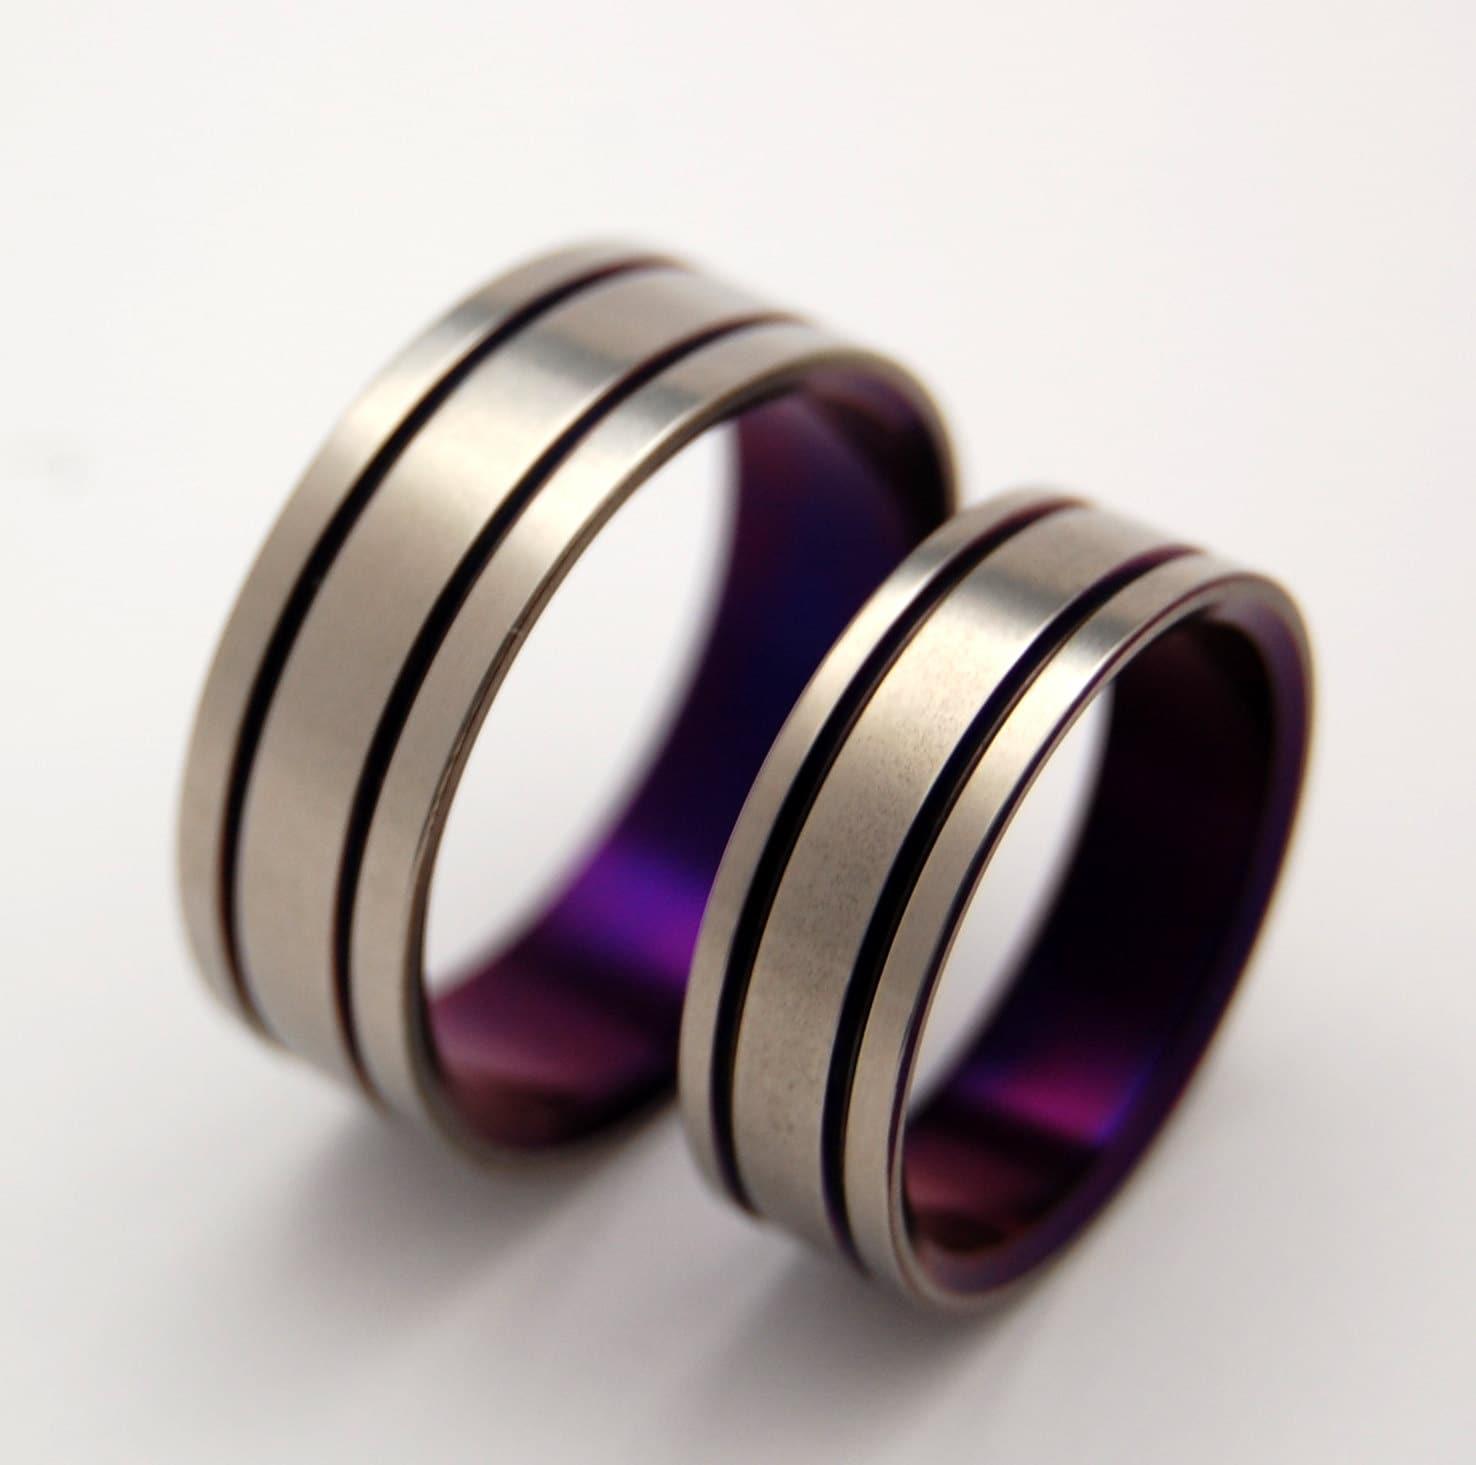 mens titanium ring mens titanium wedding rings Titanium Wedding Band Set purple wedding ring mens ring womens ring handmade ring custom made ring matching wedding set ALMA MATER